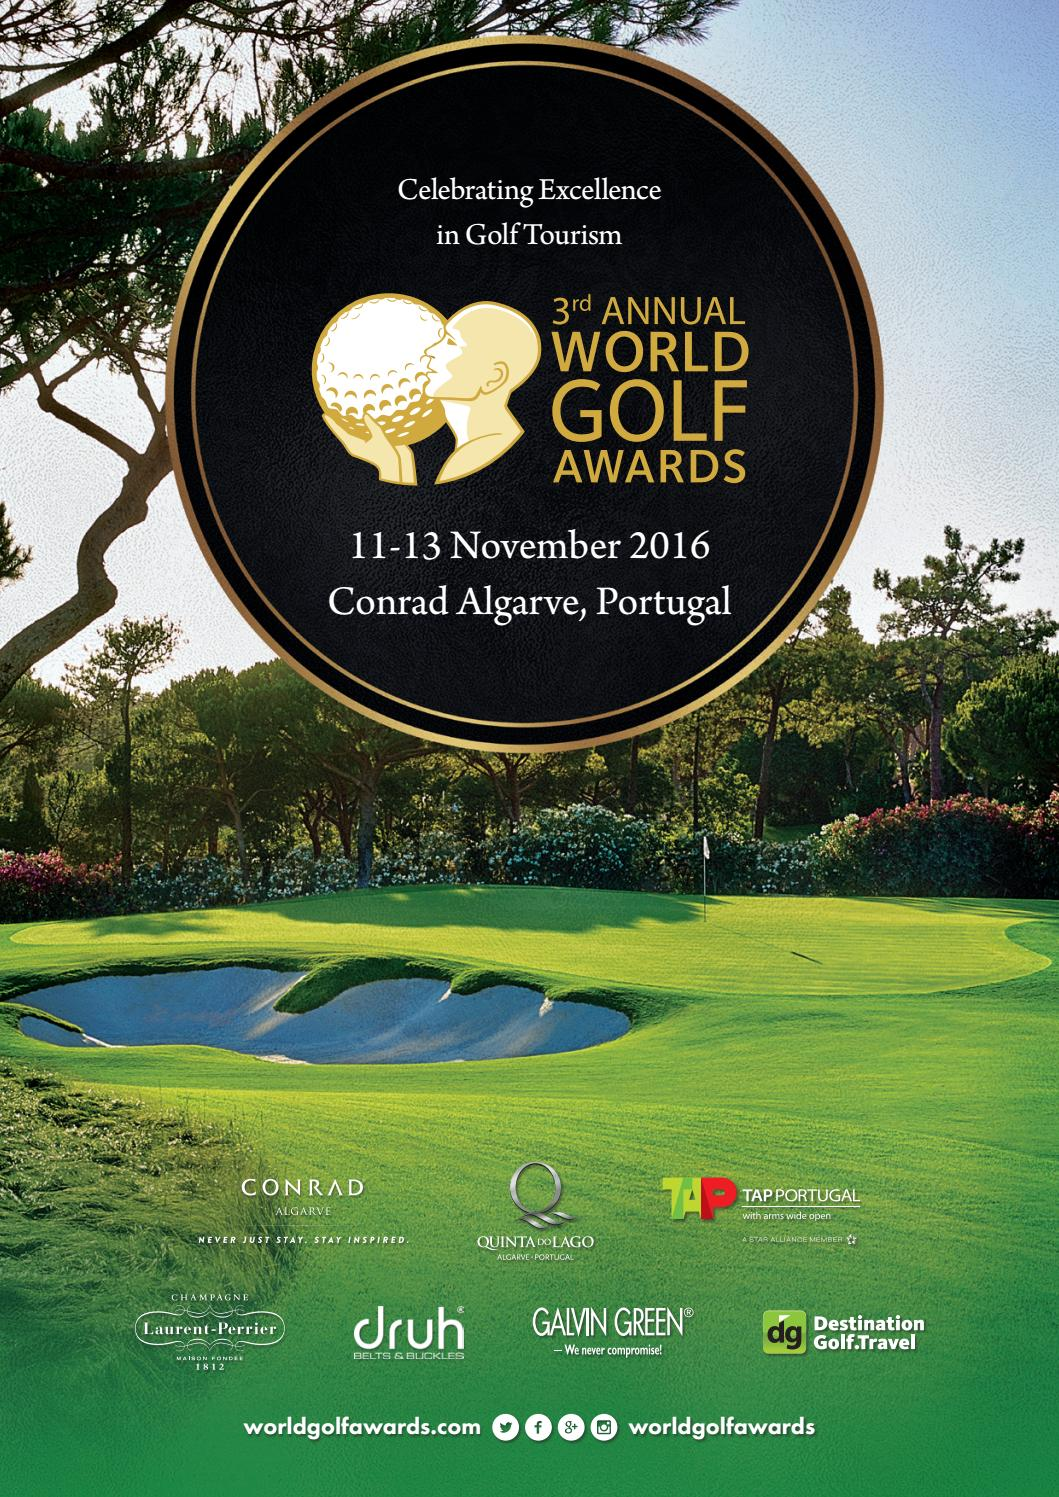 Sueno hotel atlantic golf holidays atlantic golf holidays - Sueno Hotel Atlantic Golf Holidays Atlantic Golf Holidays 20